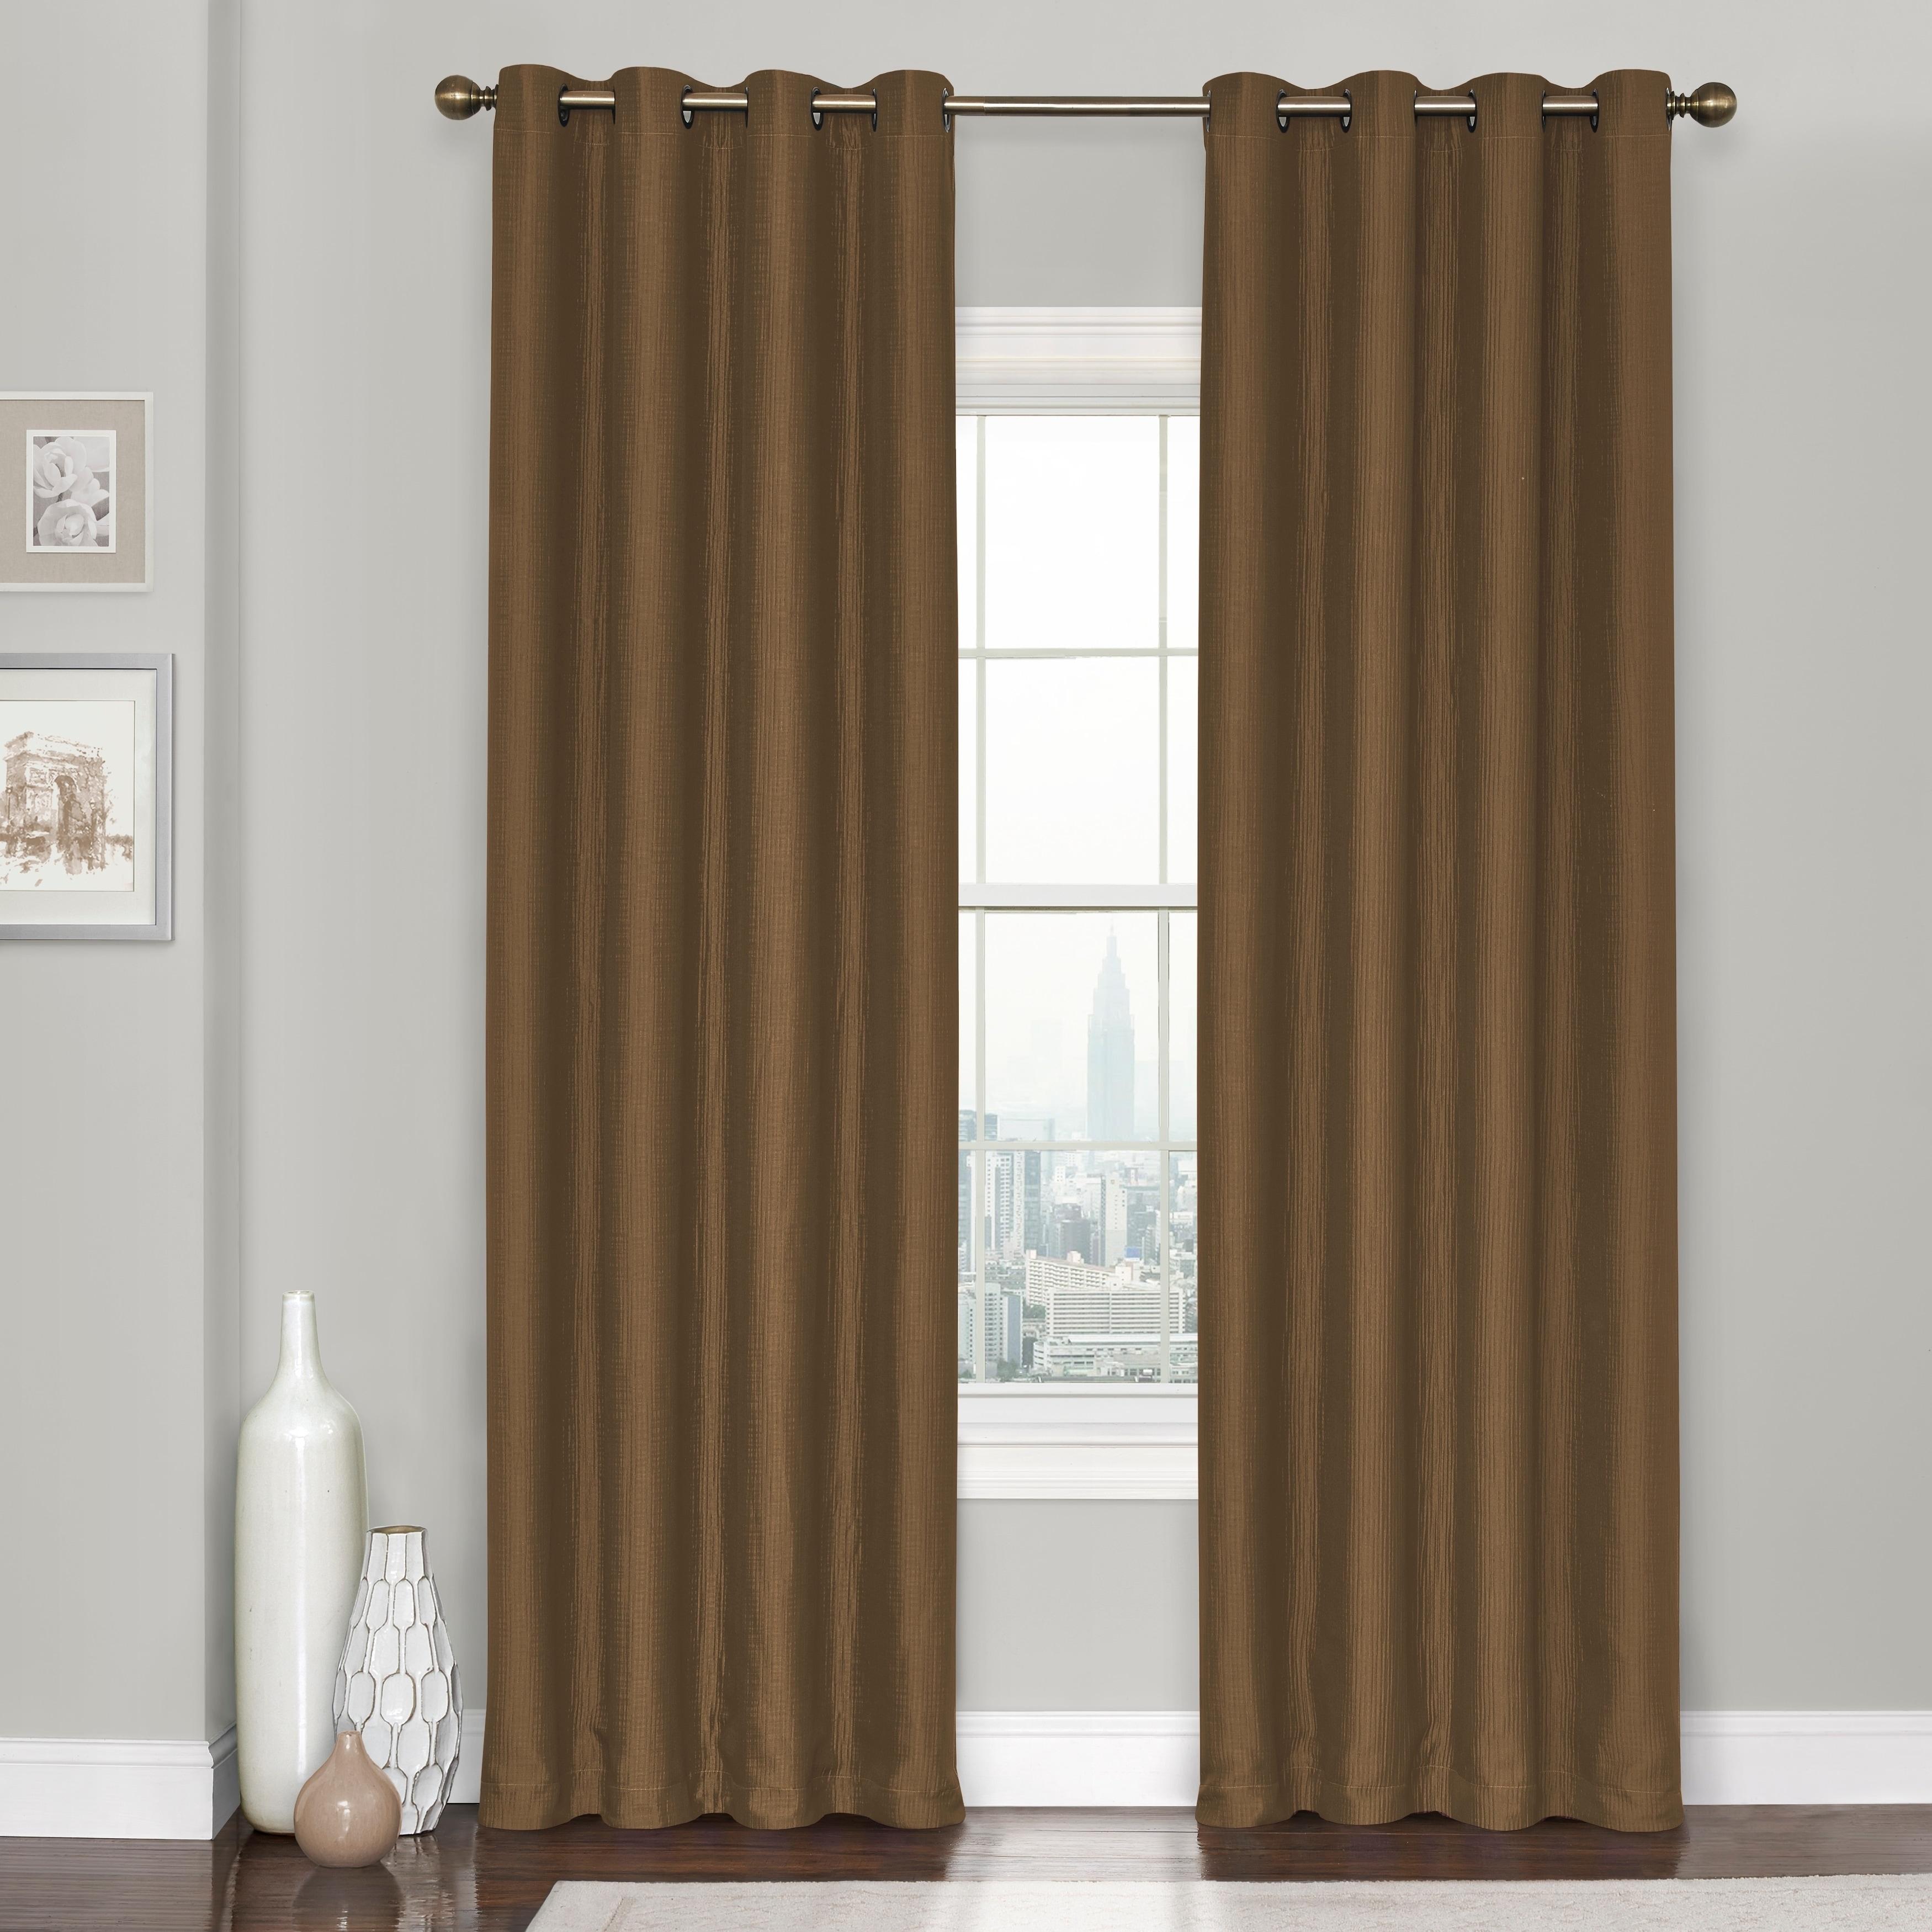 Heavy Black Curtains